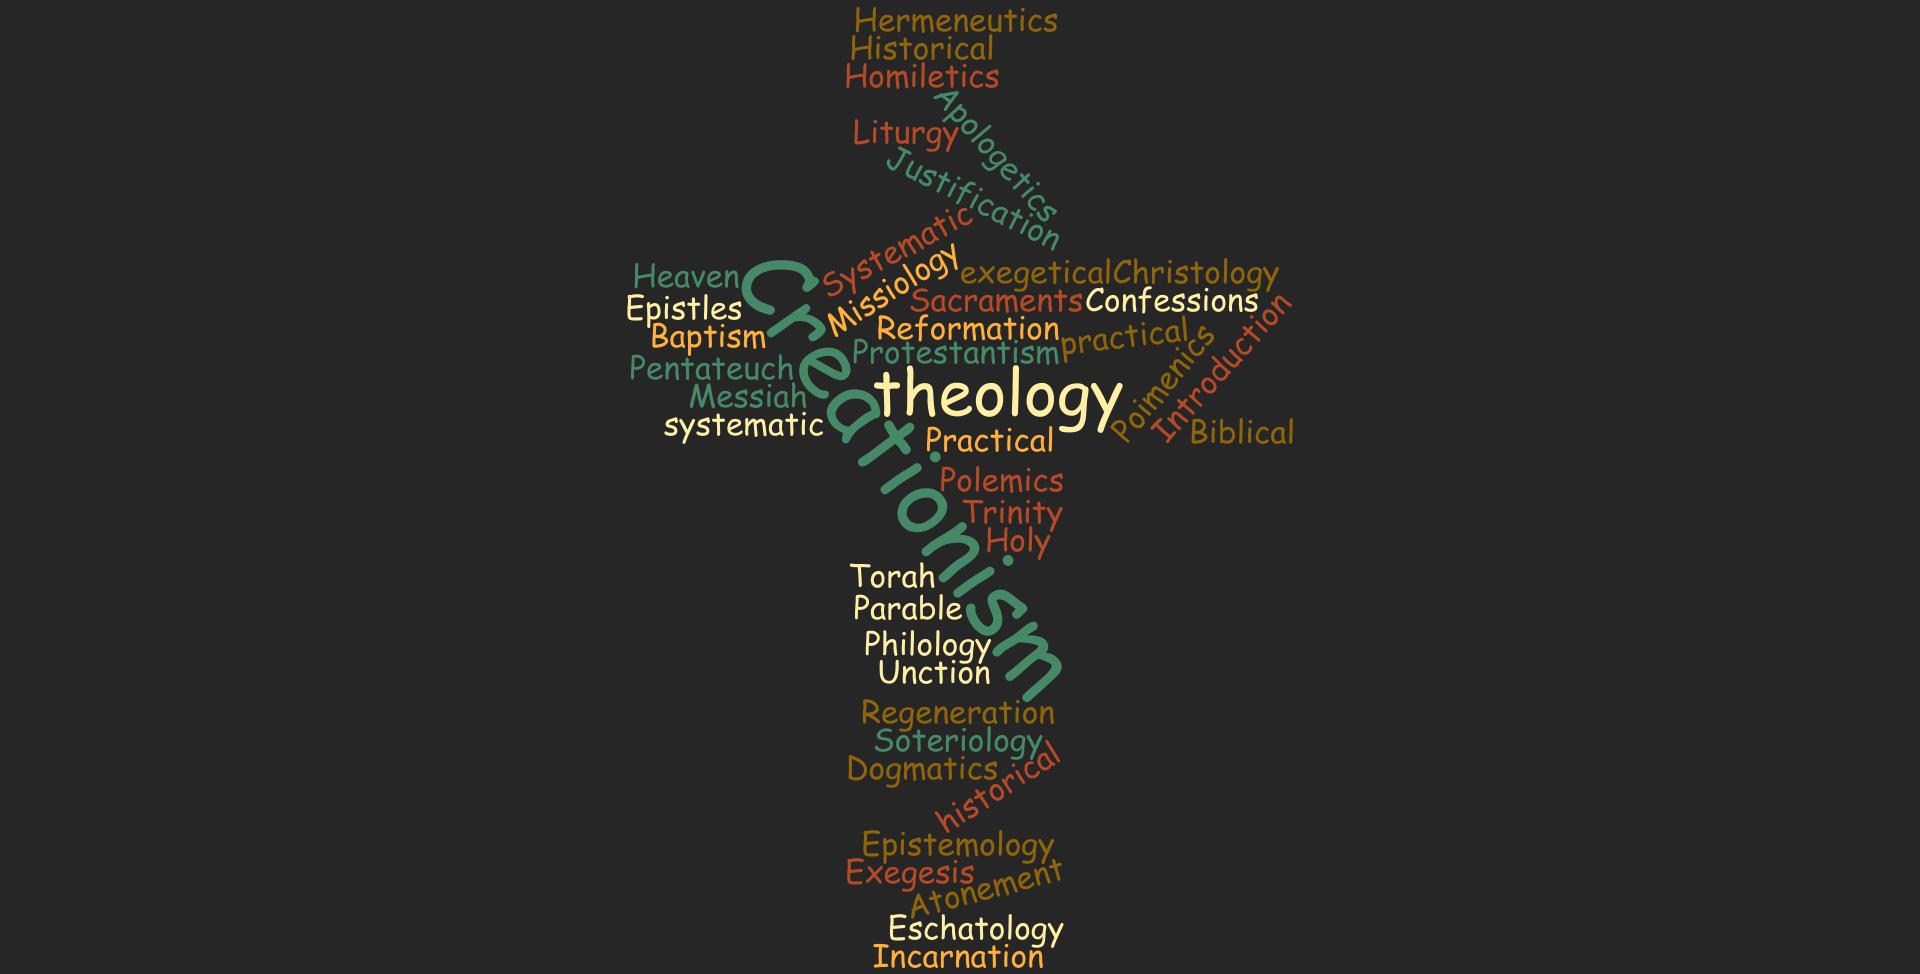 ologies & key terms cross